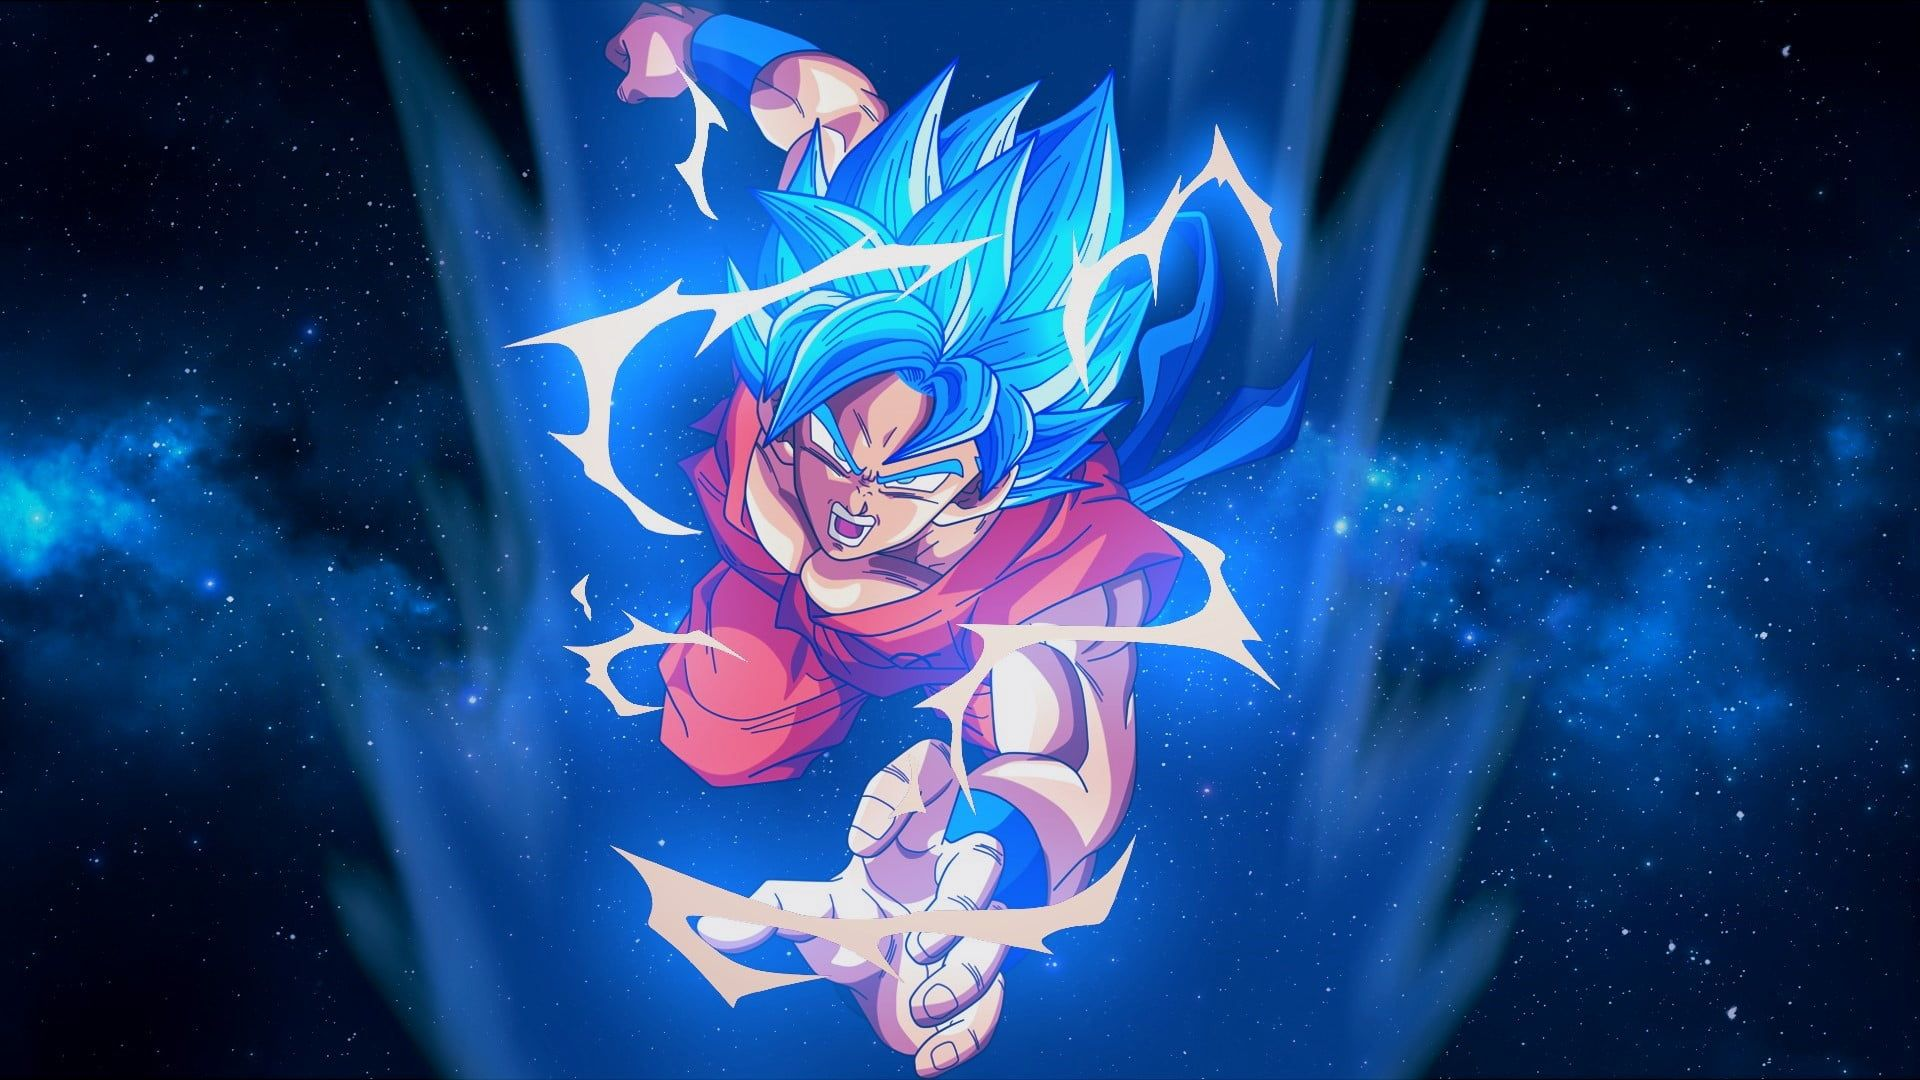 Super Instinct Son Goku Wallpaper Dragon Ball Super Saiyan Blue Son Goku Dragon Ball Super 1080p Wall Goku Wallpaper Super Saiyan Blue Goku Super Saiyan Blue 1080p goku blue wallpaper